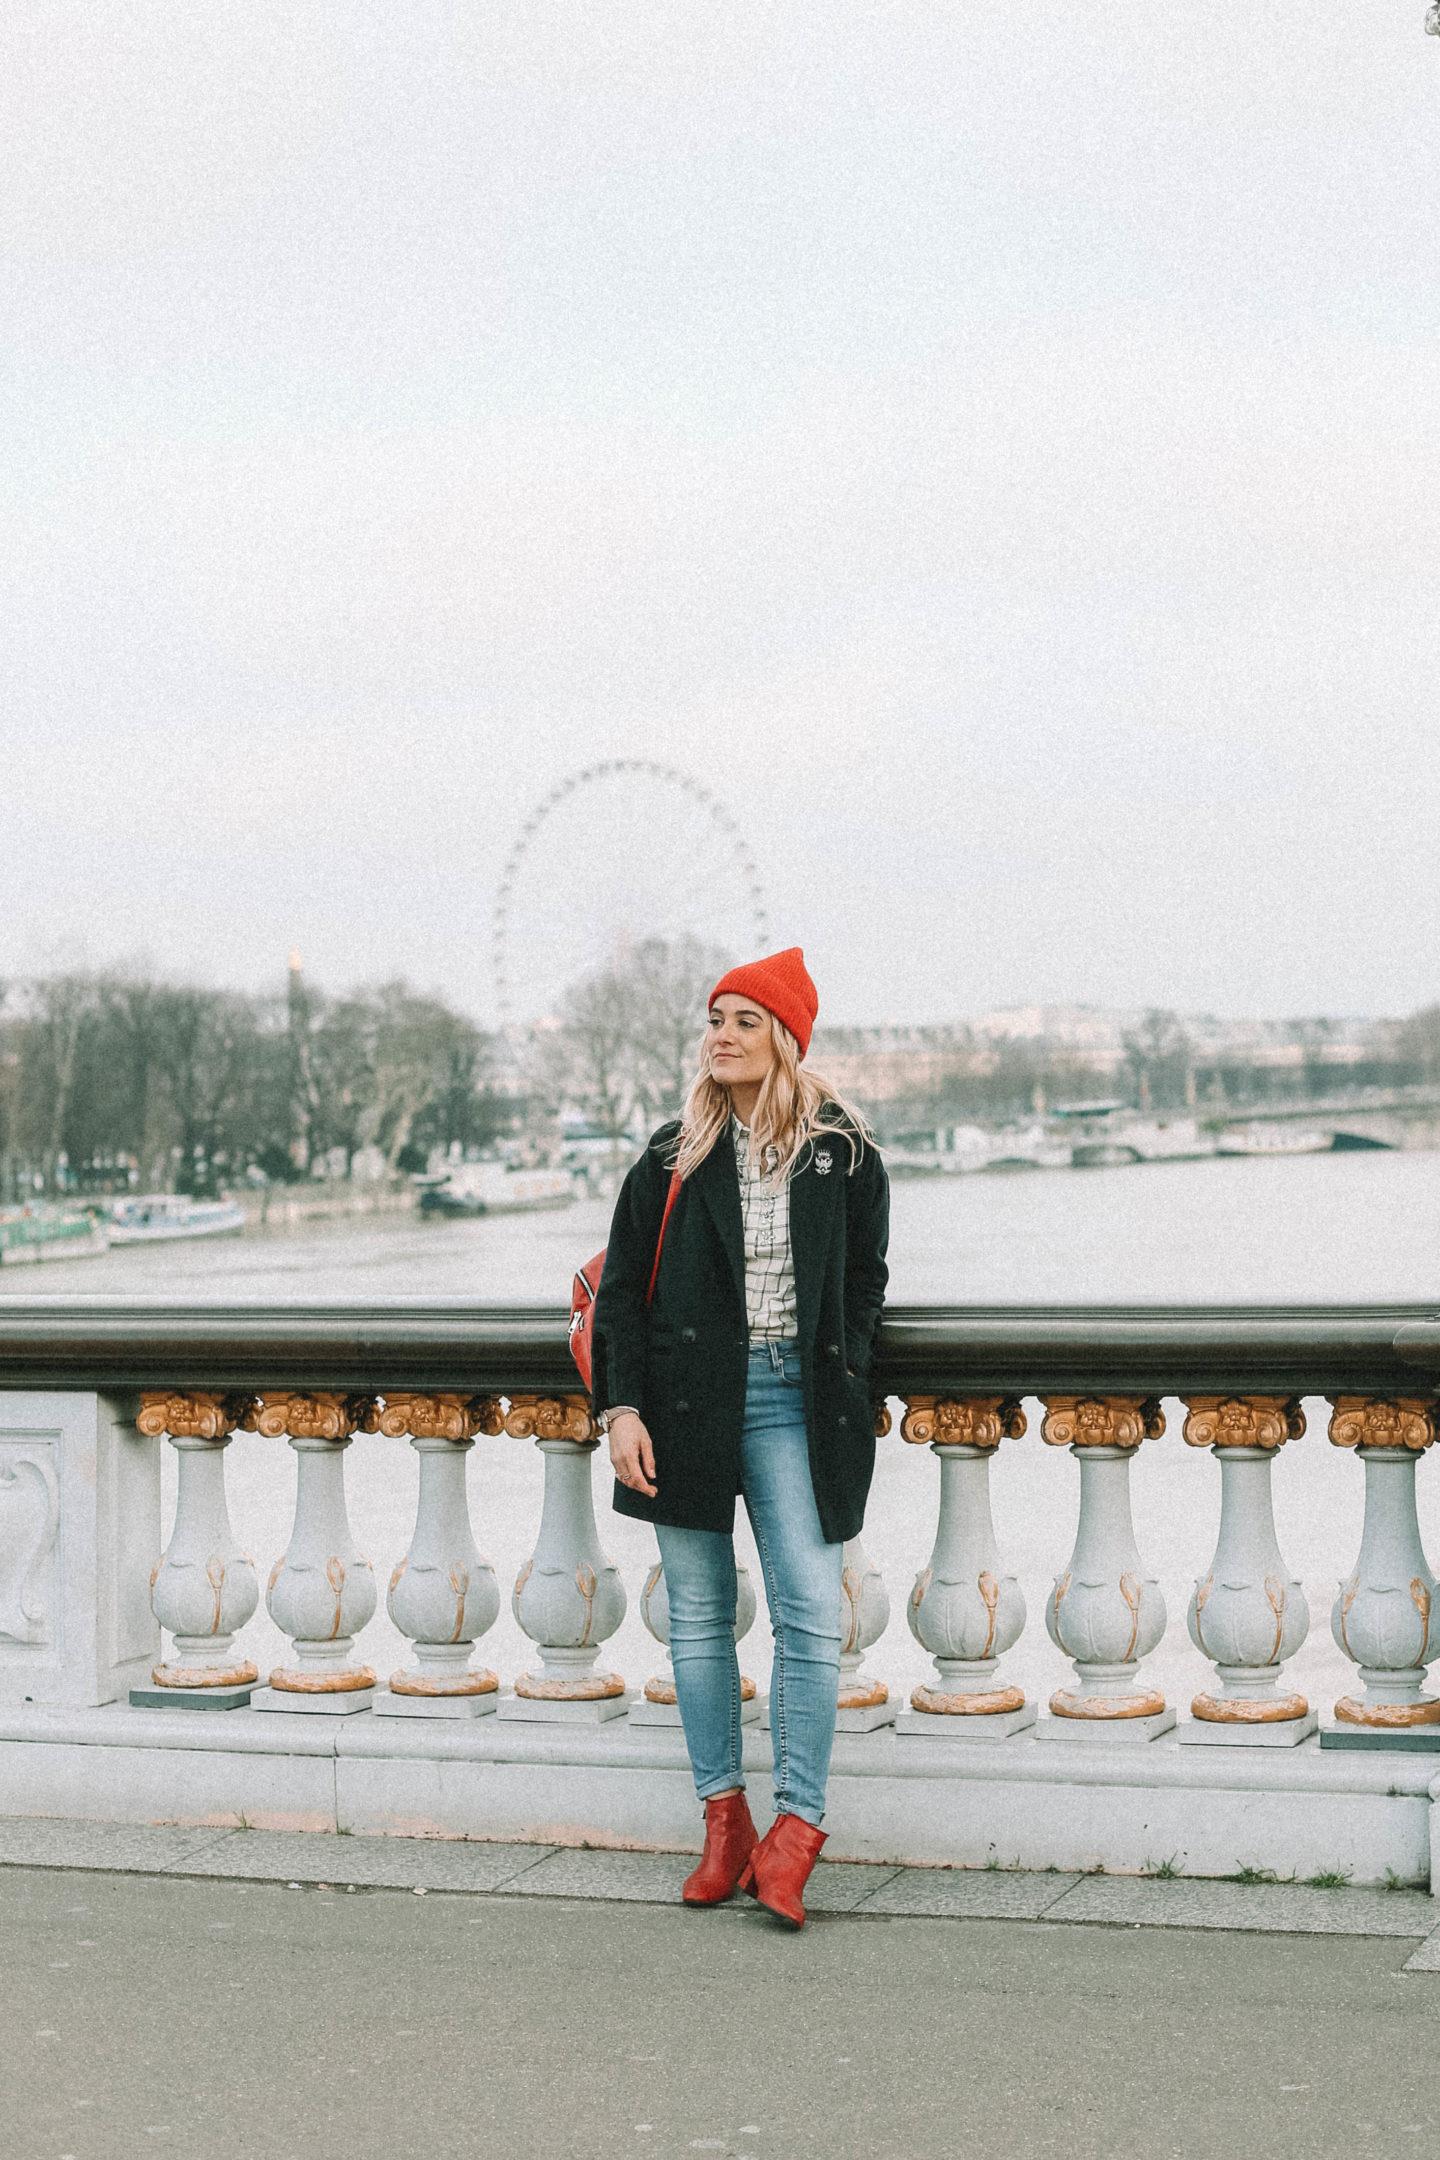 Denim Reiko Jeans - Blondie Baby blog mode et voyages